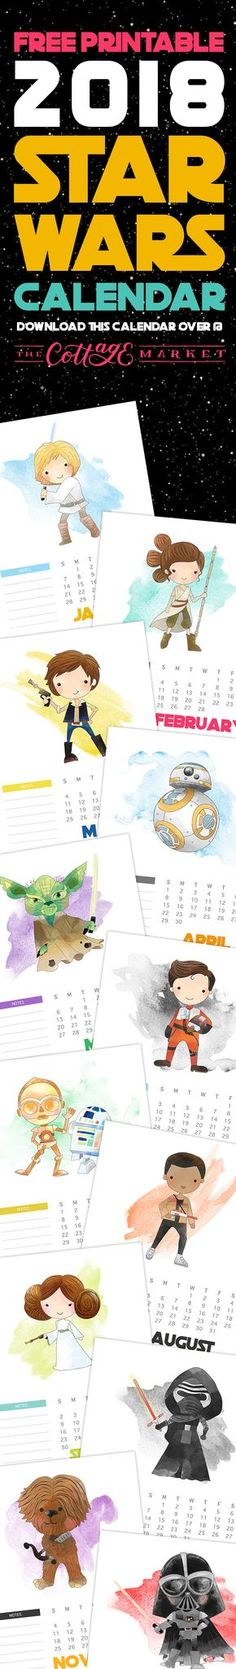 Free printable 2018 Star Wars calendar